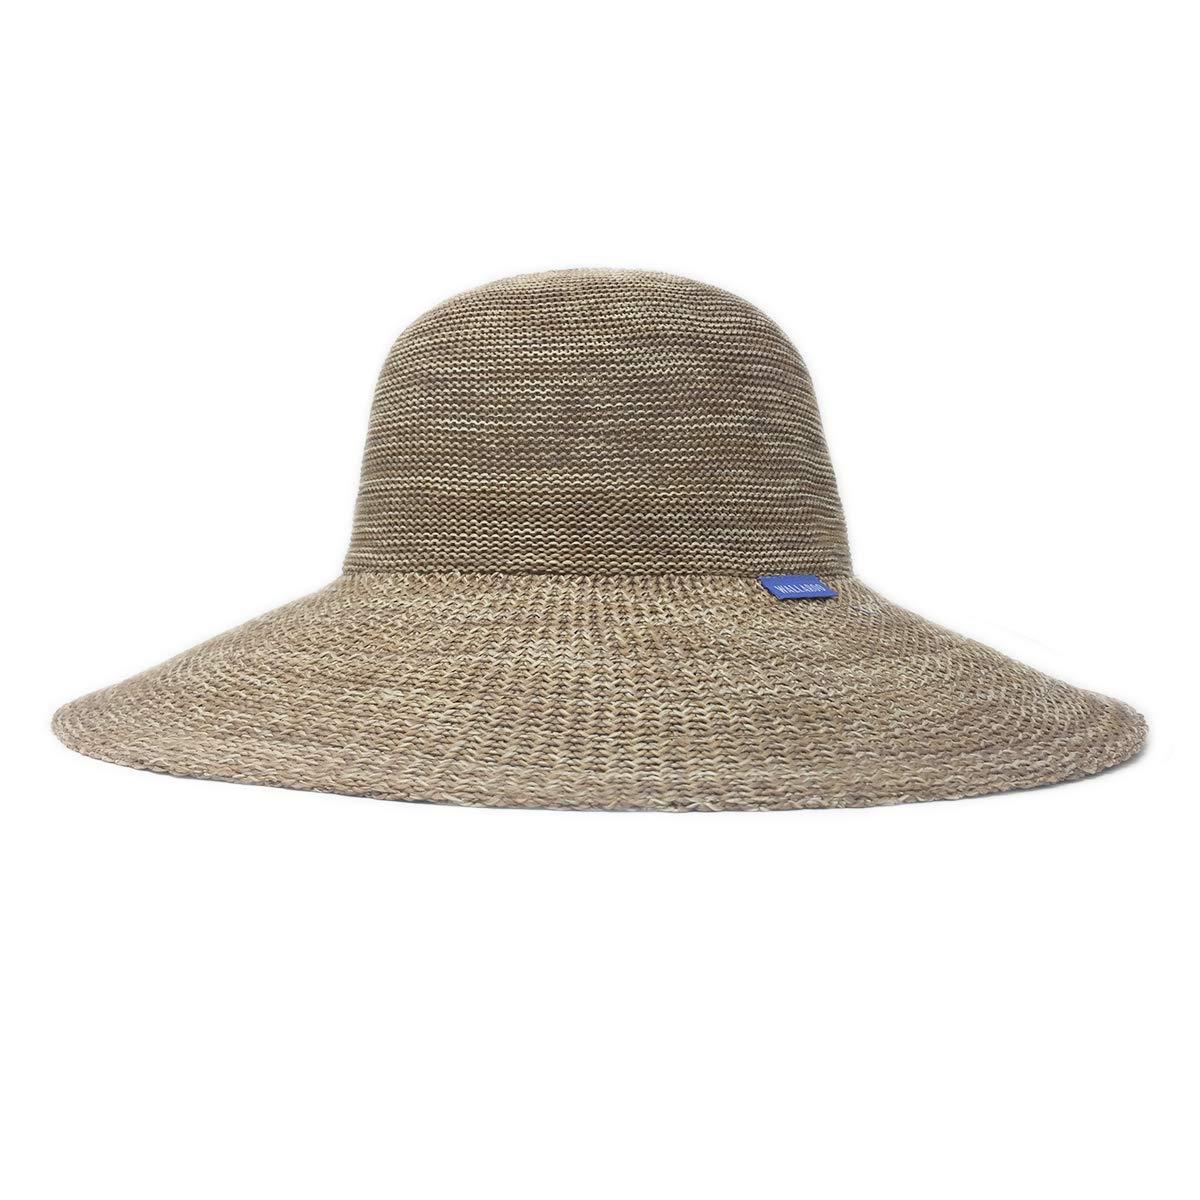 359c22fb3 Wallaroo Women's Victoria Diva Sun Hat - Packable Straw Hat (Mixed ...